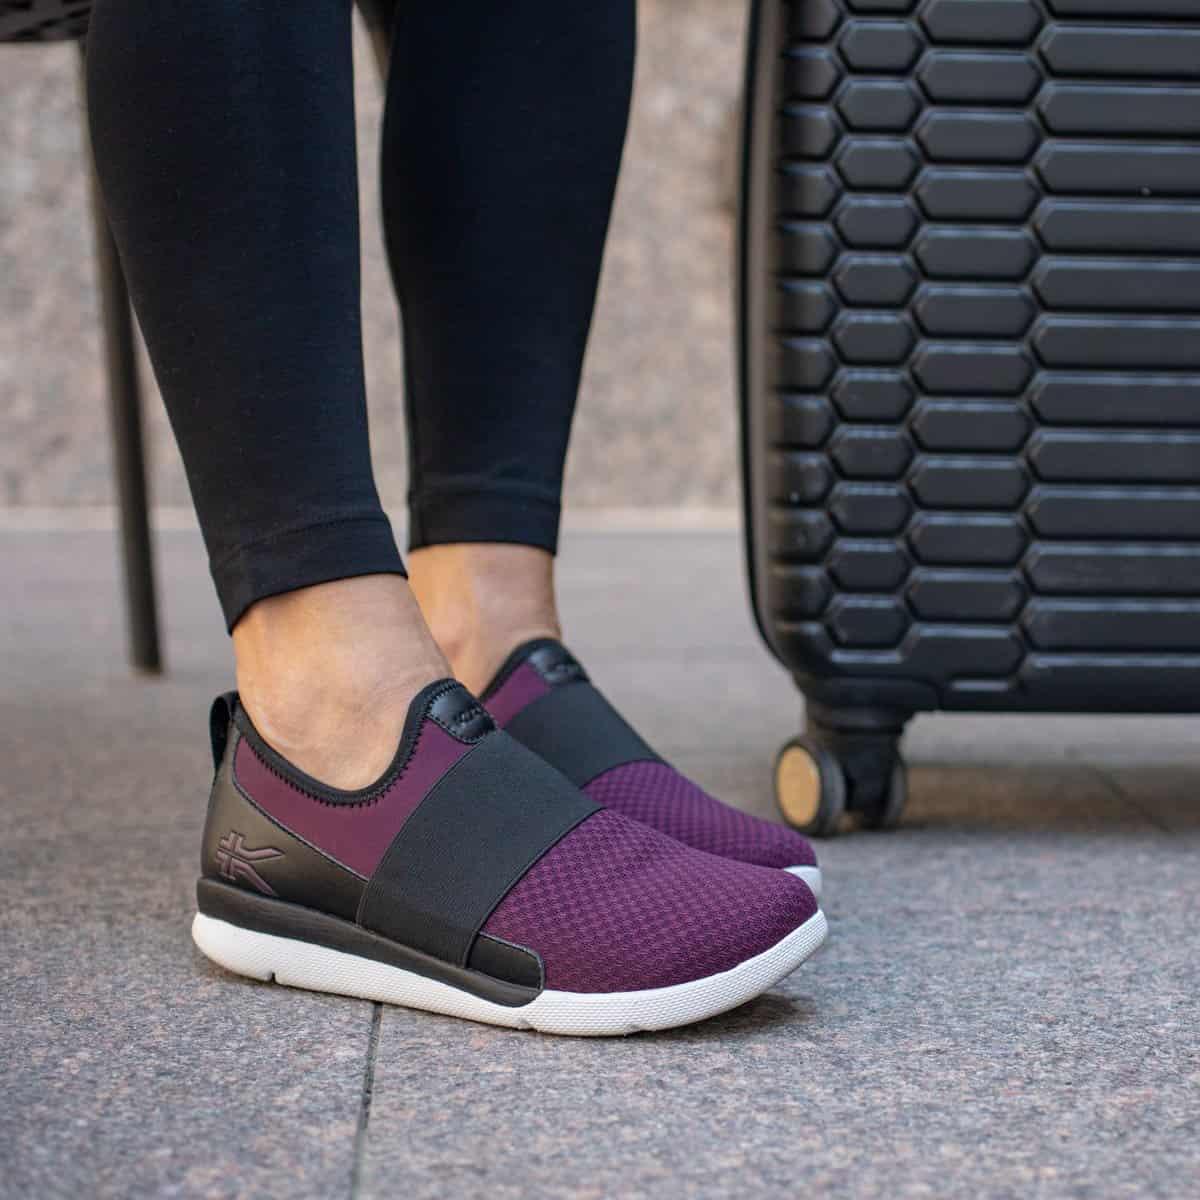 lady wearing plantar fasciitis shoes